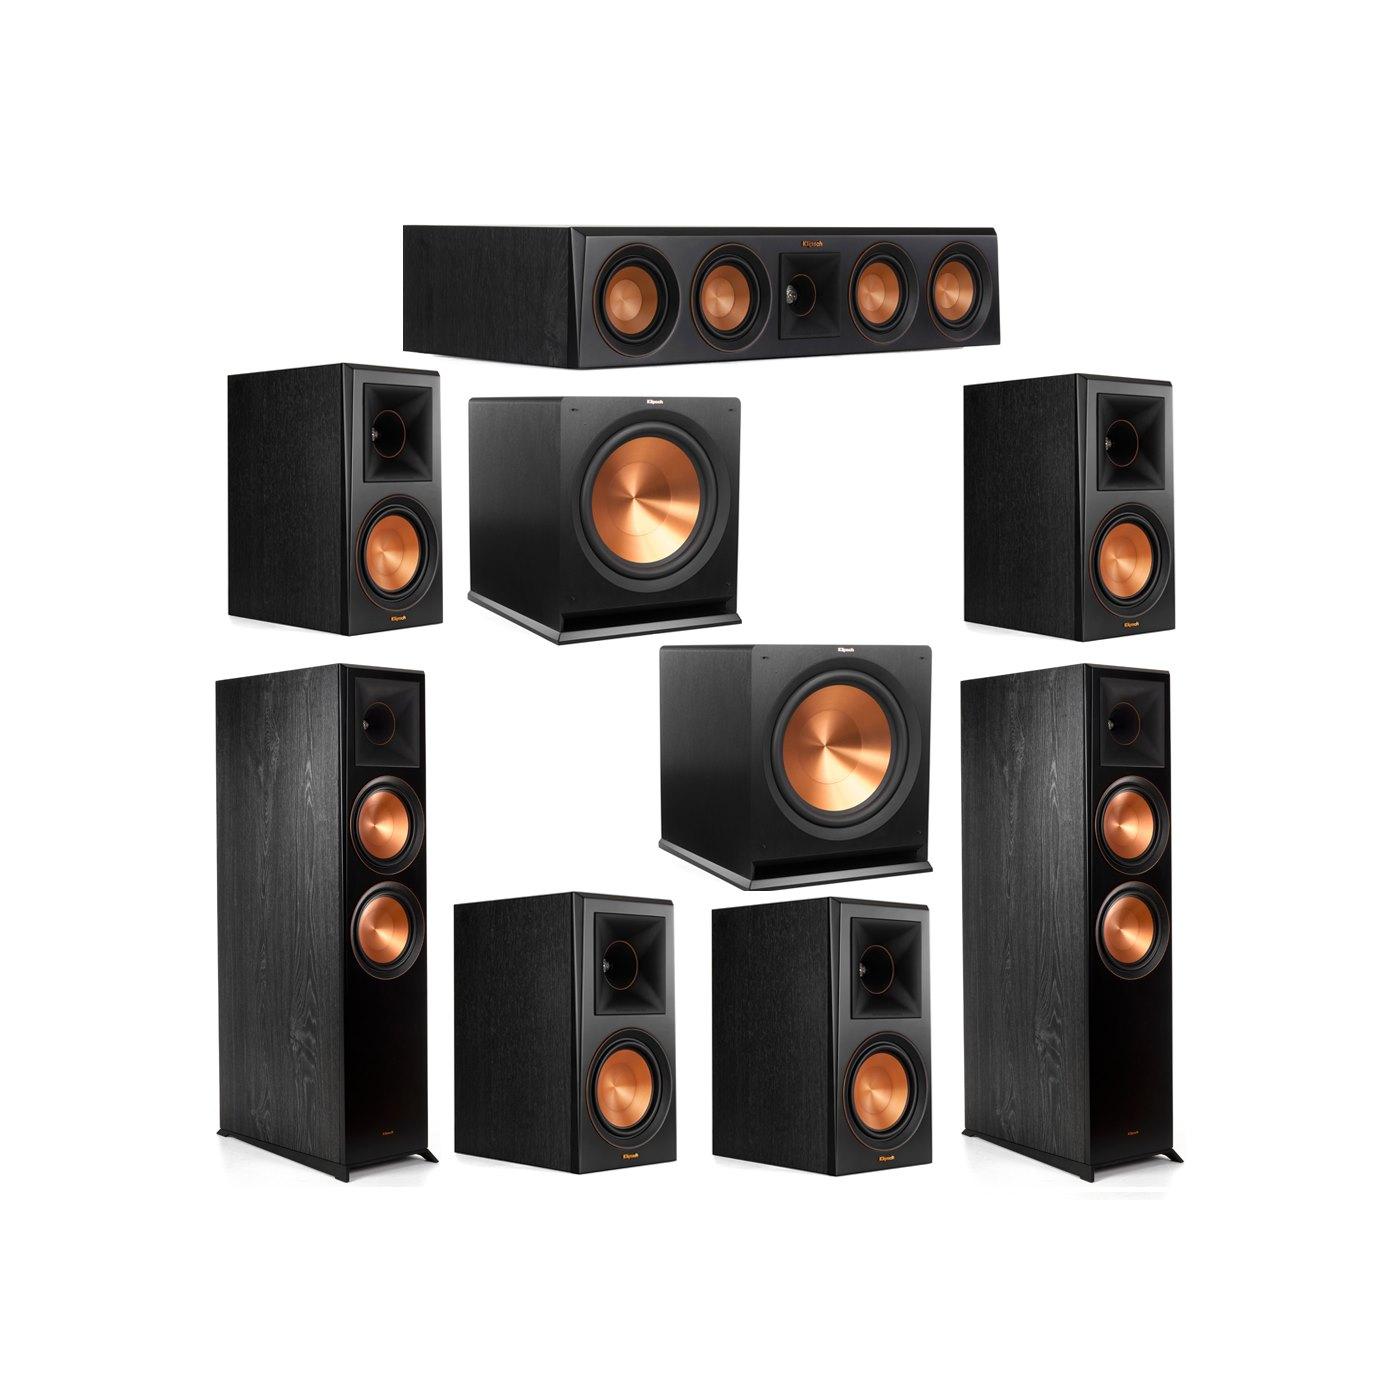 Klipsch 7.2 System with 2 RP-8000F Floorstanding Speakers, 1 Klipsch RP-404C Center Speaker, 4 Klipsch RP-600M Surround Speakers, 2 Klipsch R-115SW Subwoofers